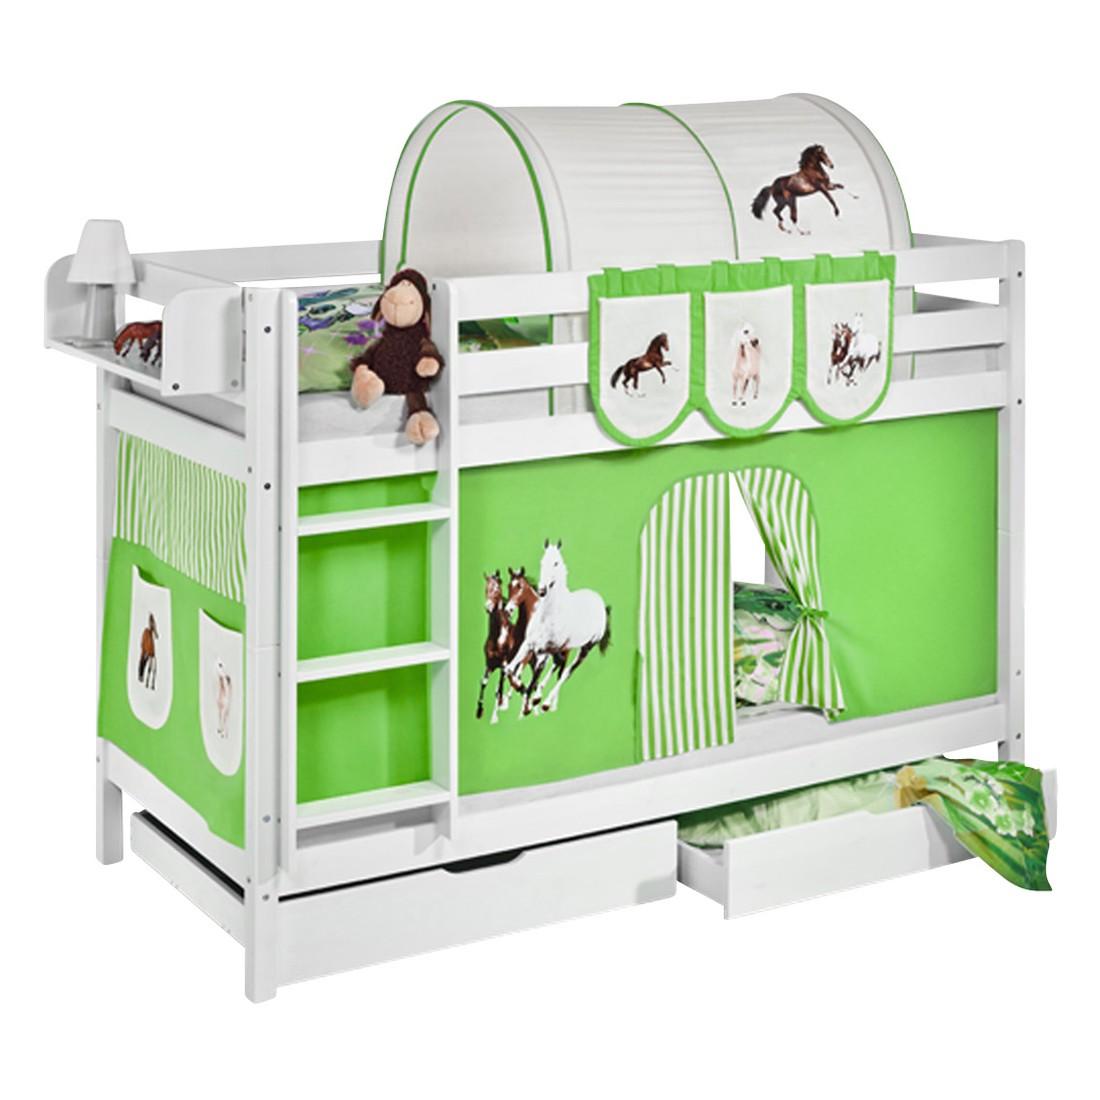 home24 Etagenbett JELLE Pferde Gruen | Kinderzimmer > Kinderbetten > Etagenbetten | Lilokids